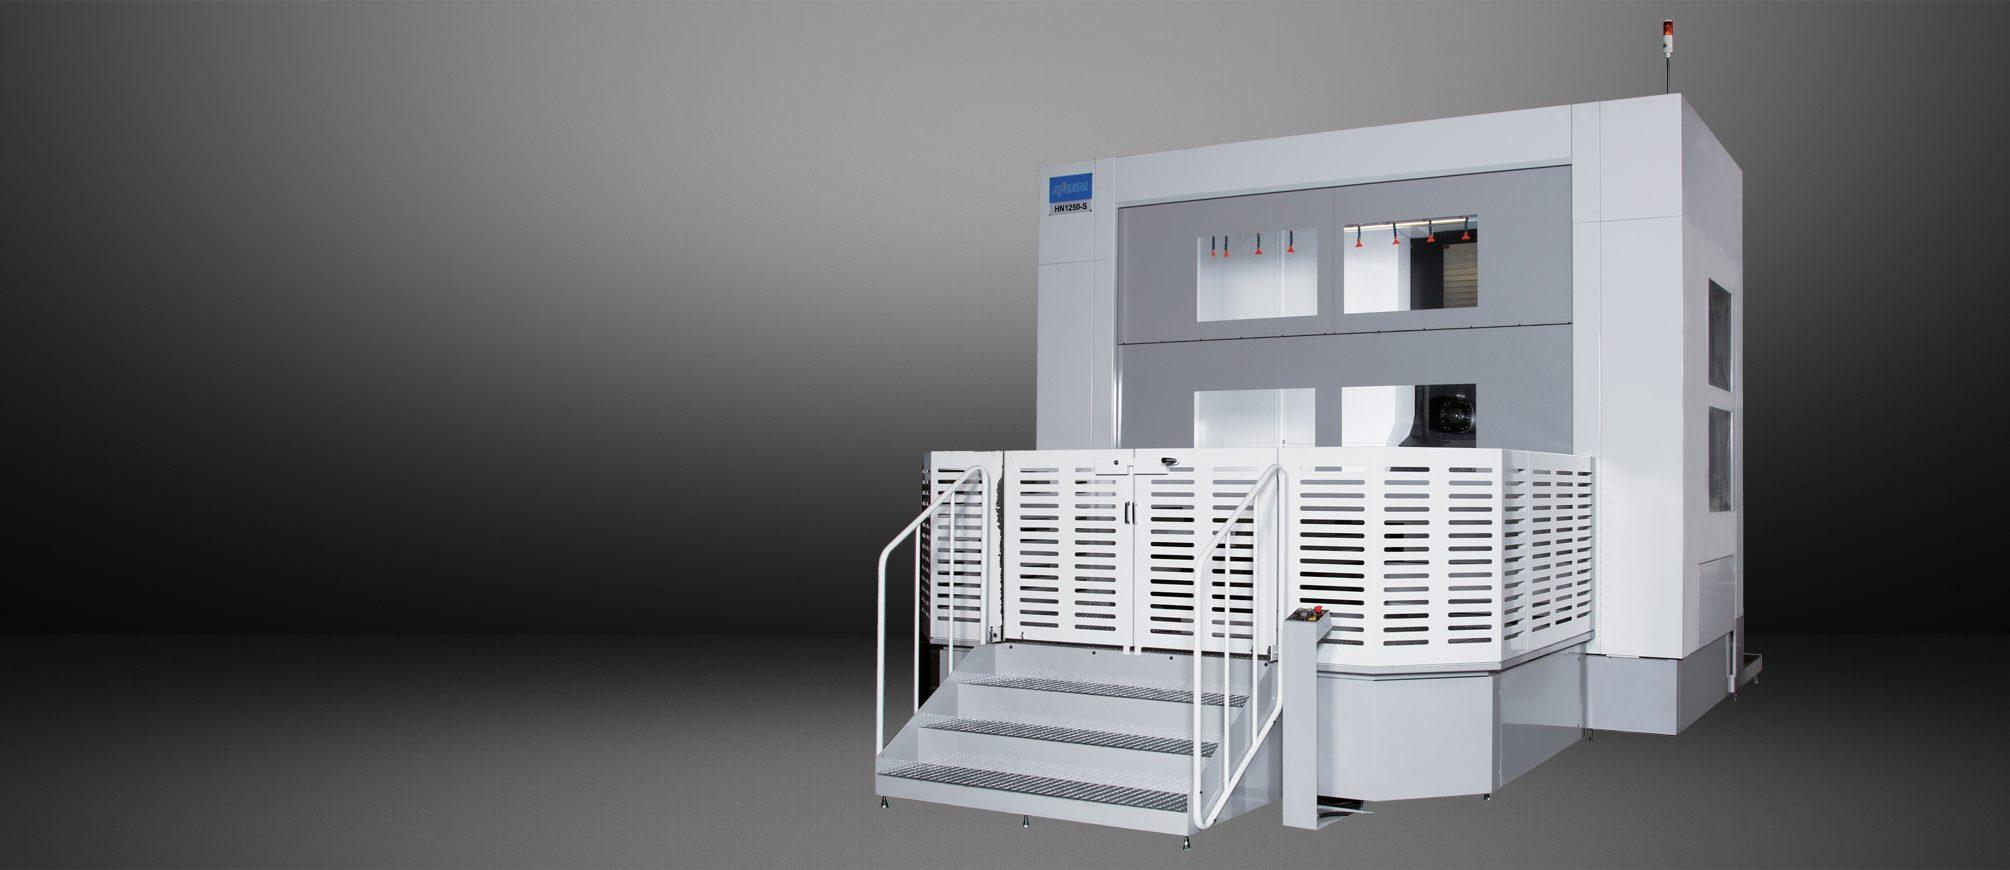 HN1250-S BAR Horizontal Machining Centers